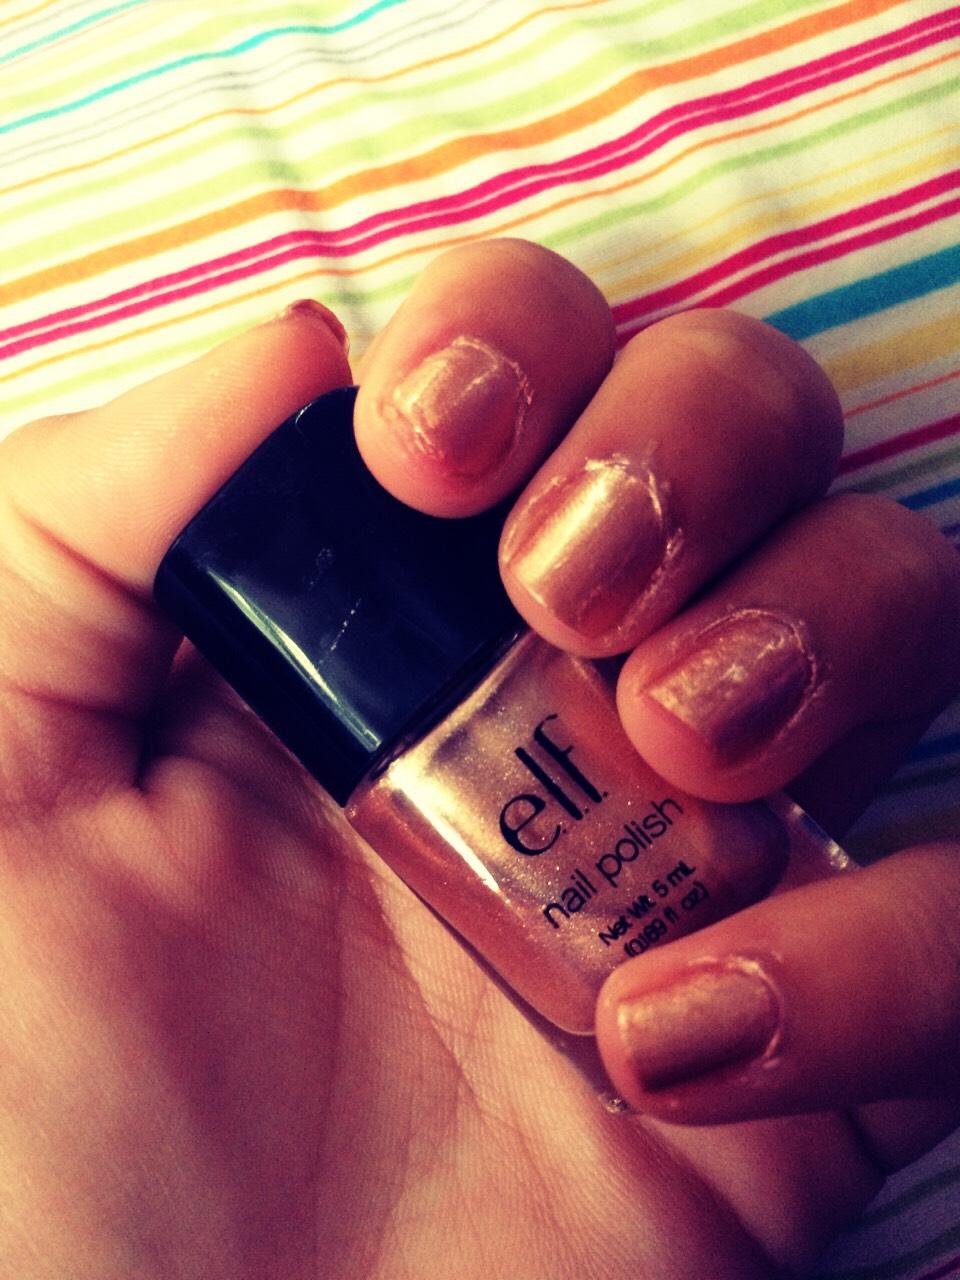 Apply 2 coats of nude polish